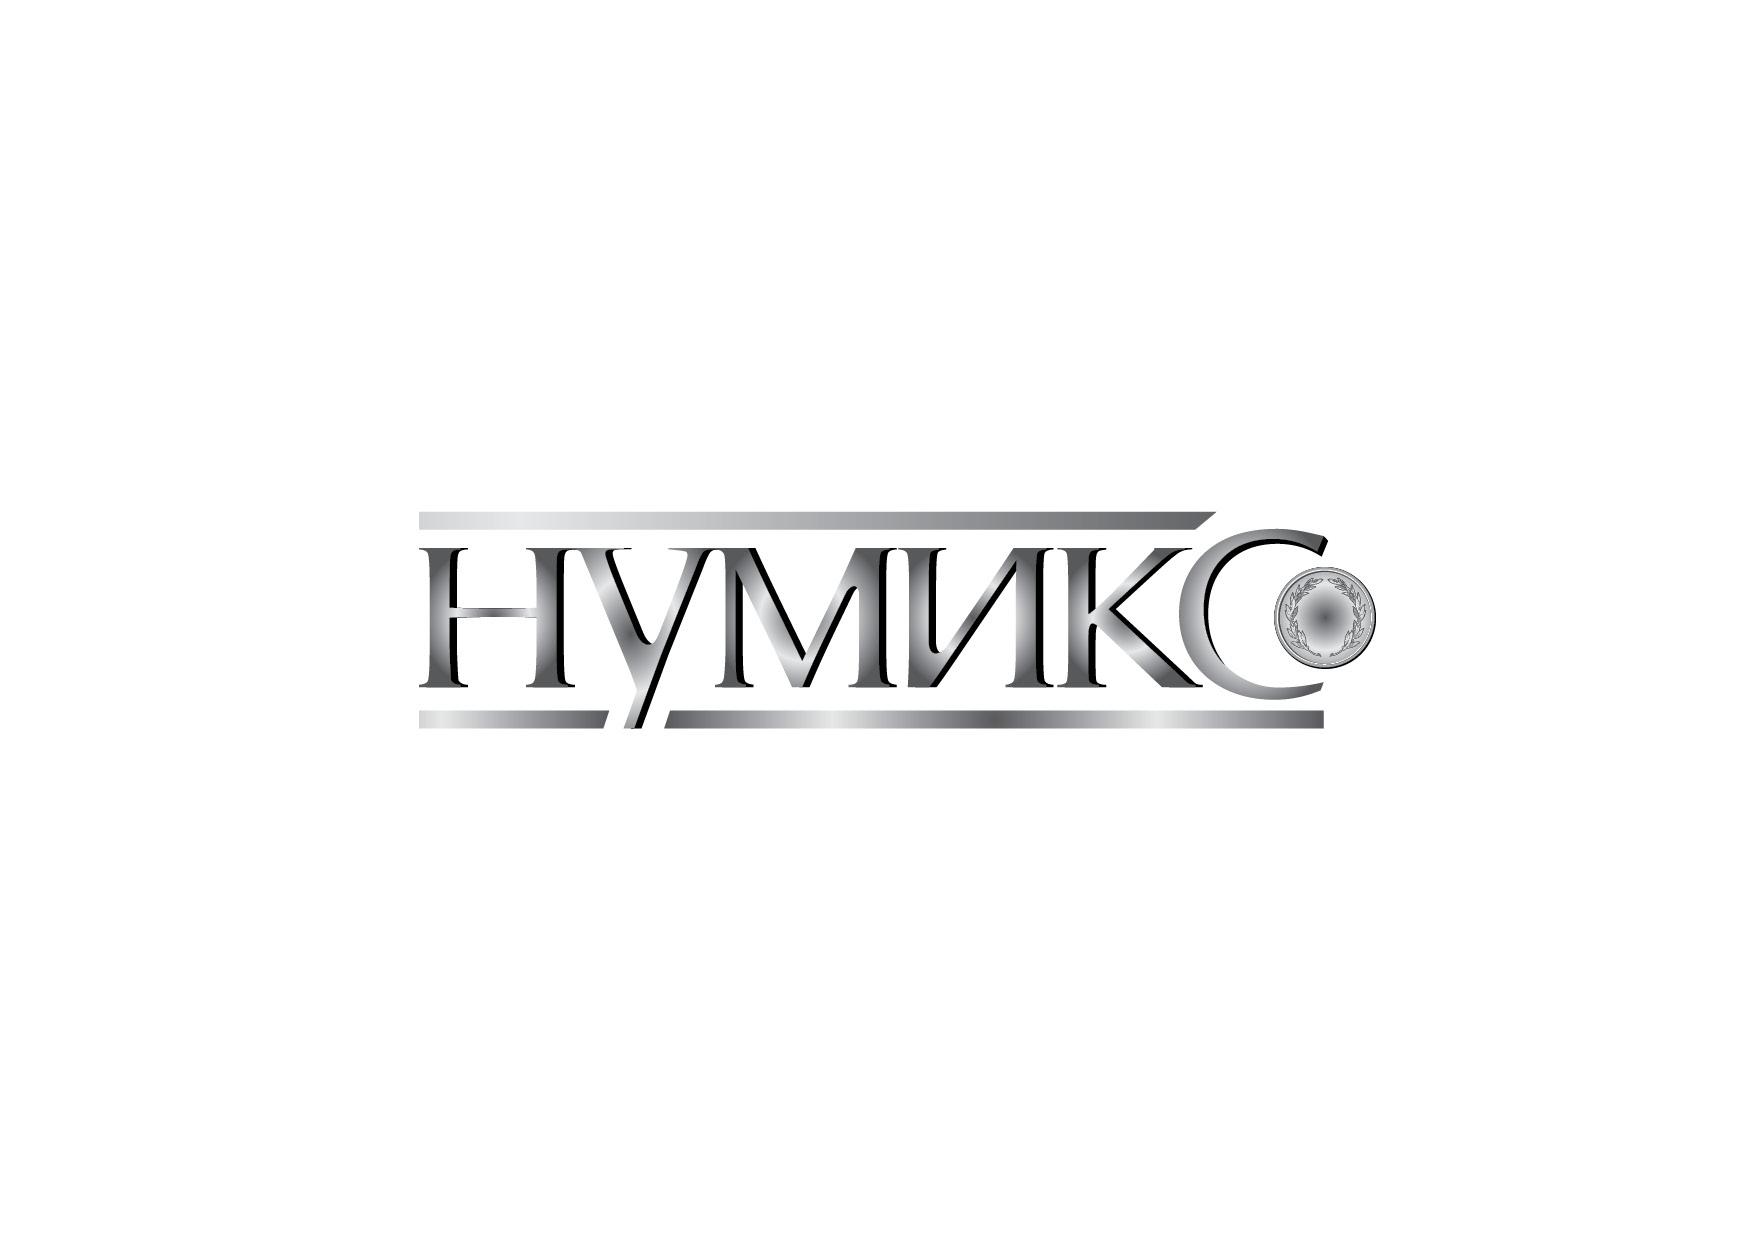 Логотип для интернет-магазина фото f_4585ec6cb2ddf1d8.jpg